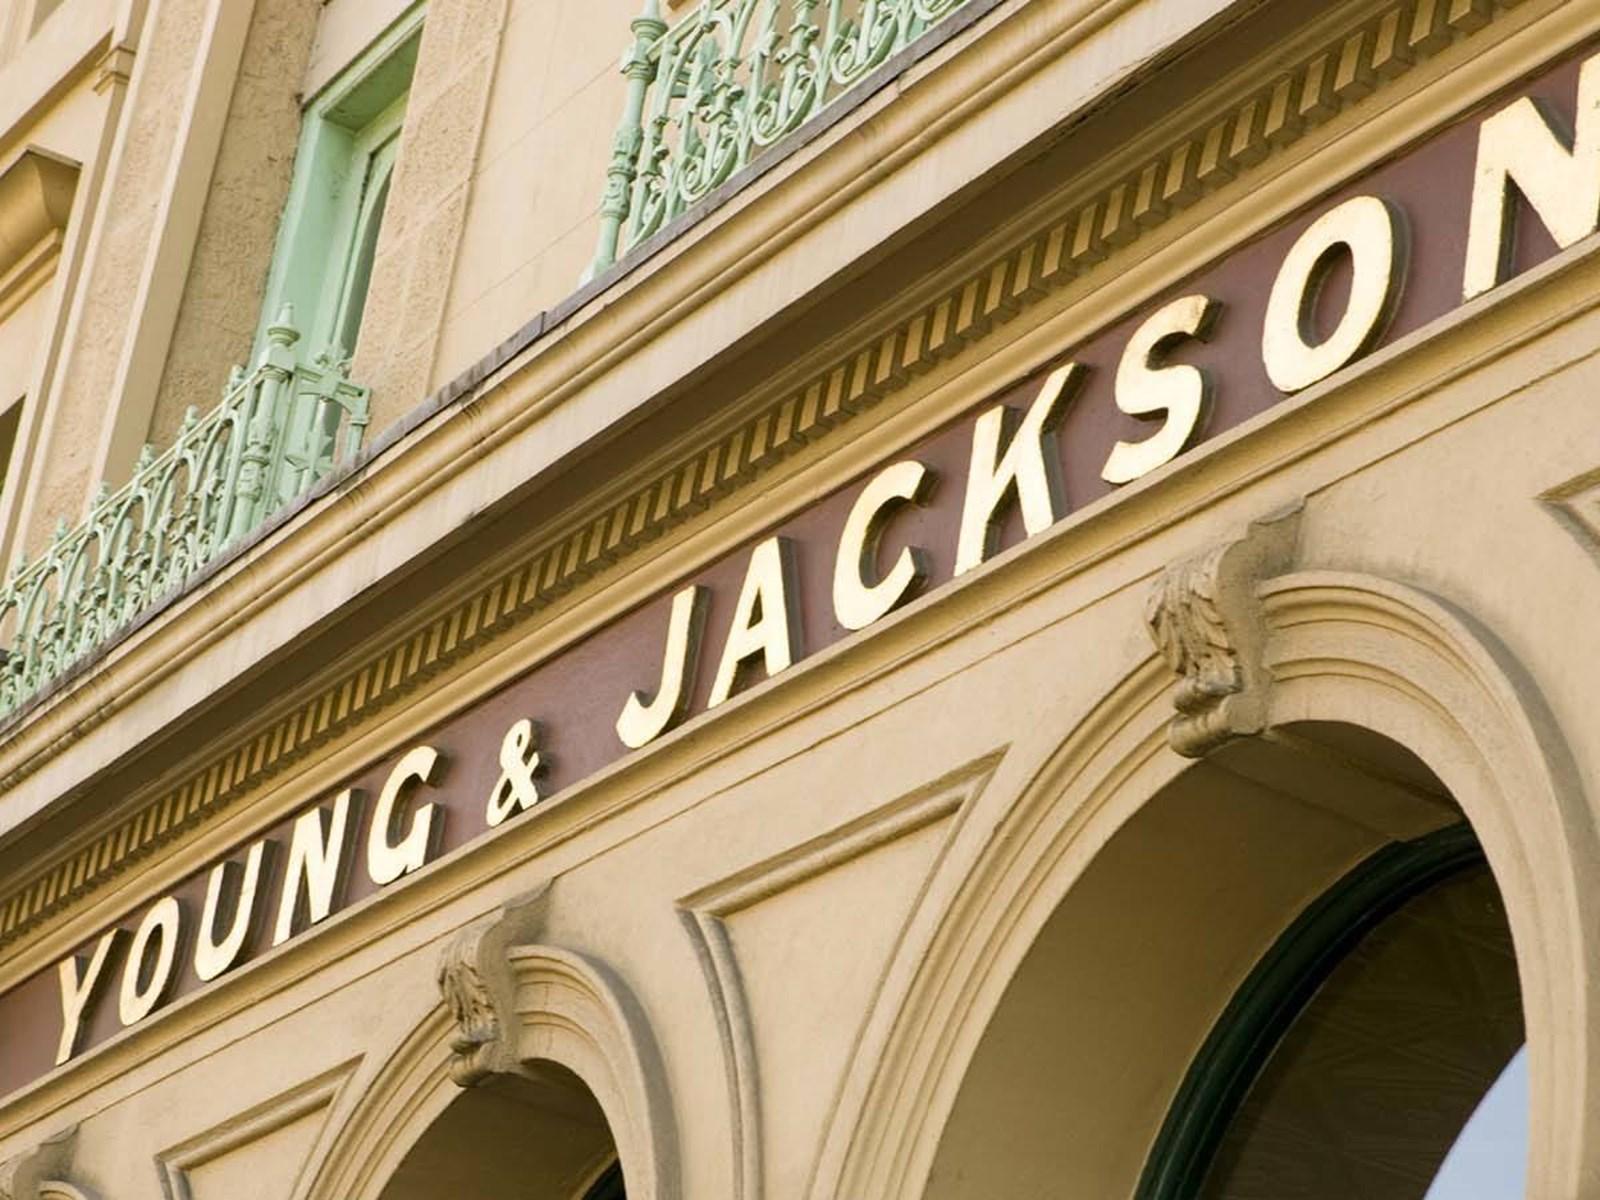 Young & Jackson, Melbourne, Victoria, Australia